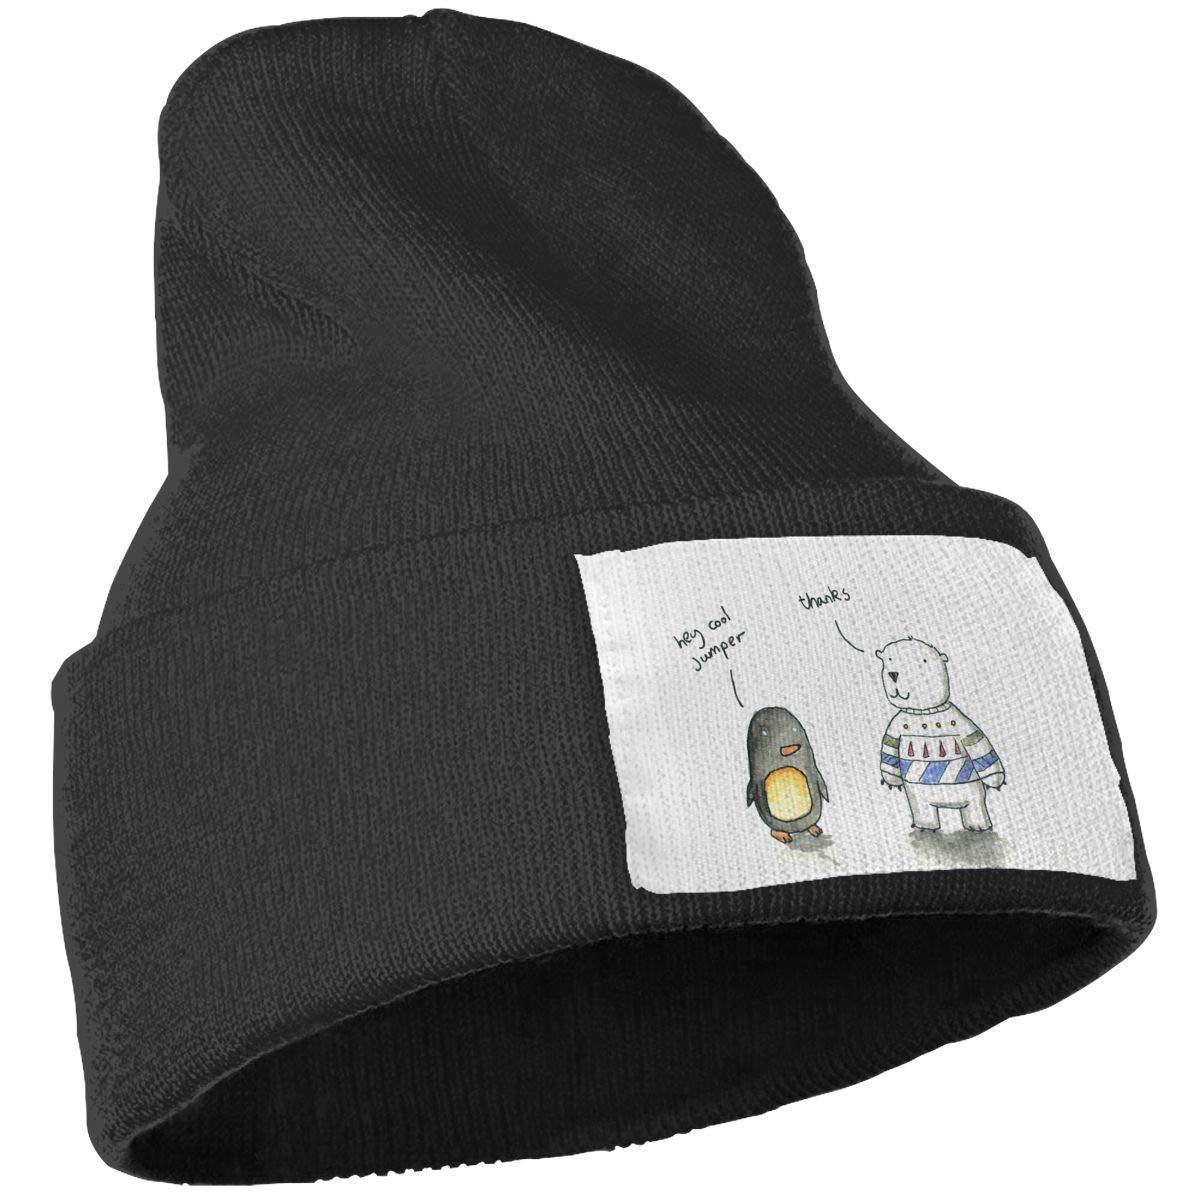 PCaag7v Cute Penguin Beanie Hat Winter Solid Warm Knit Unisex Ski Skull Cap